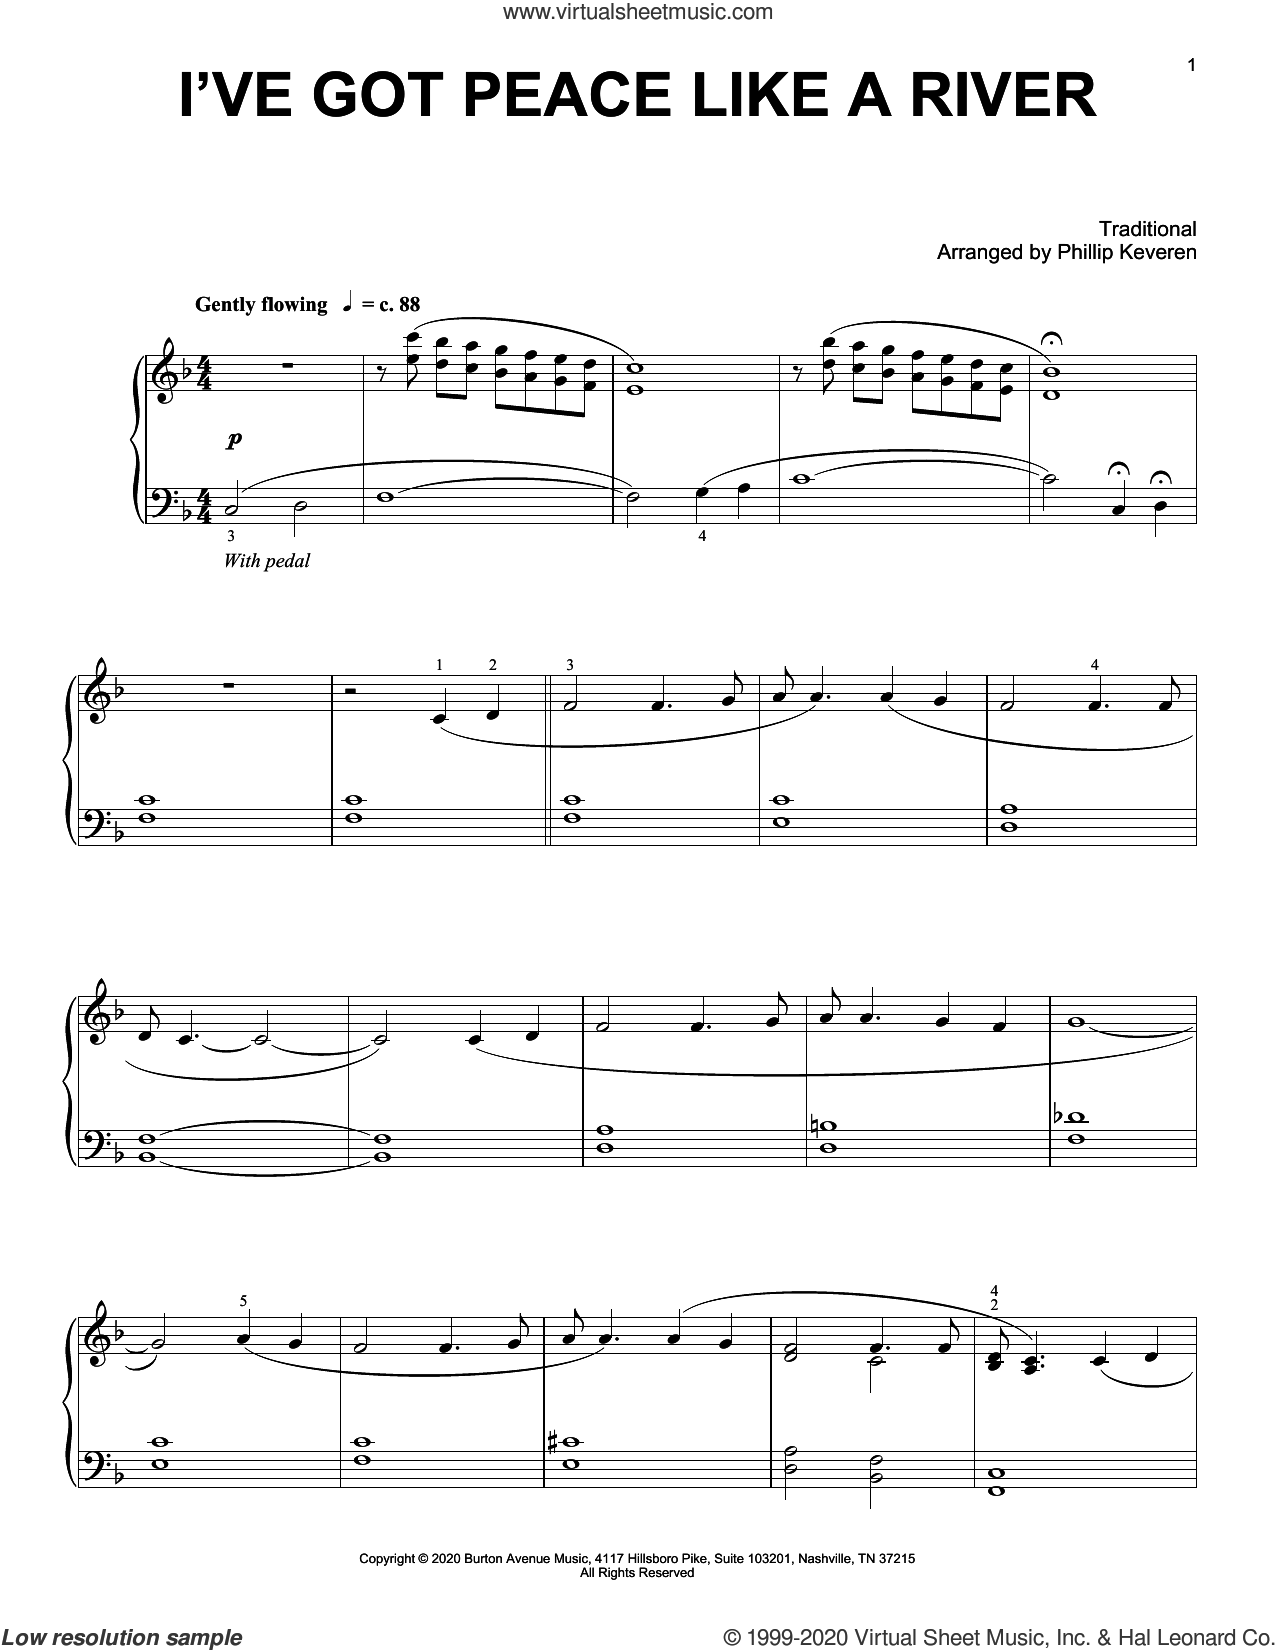 I've Got Peace Like A River (arr. Phillip Keveren) sheet music for piano solo  and Phillip Keveren, intermediate skill level